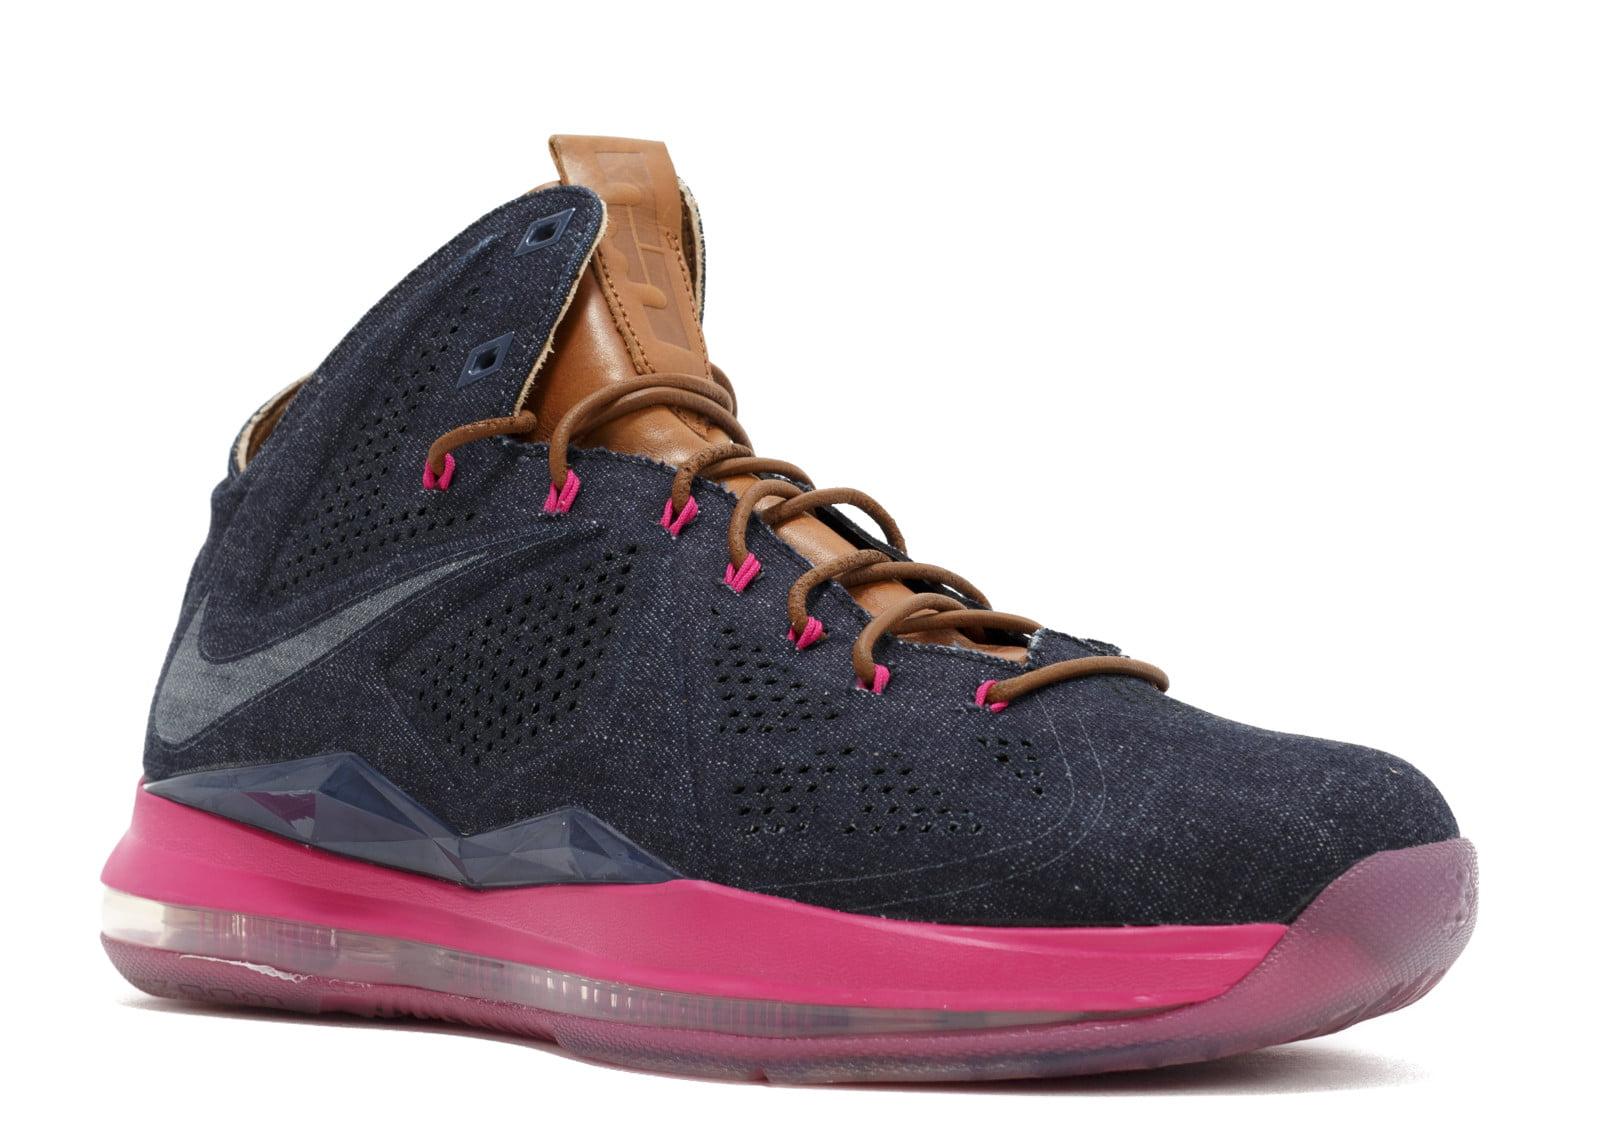 uk availability 39bdc 06845 Nike - Men - Lebron 10 Ext Denim Qs  Denim  - 597806-400 - Size 10